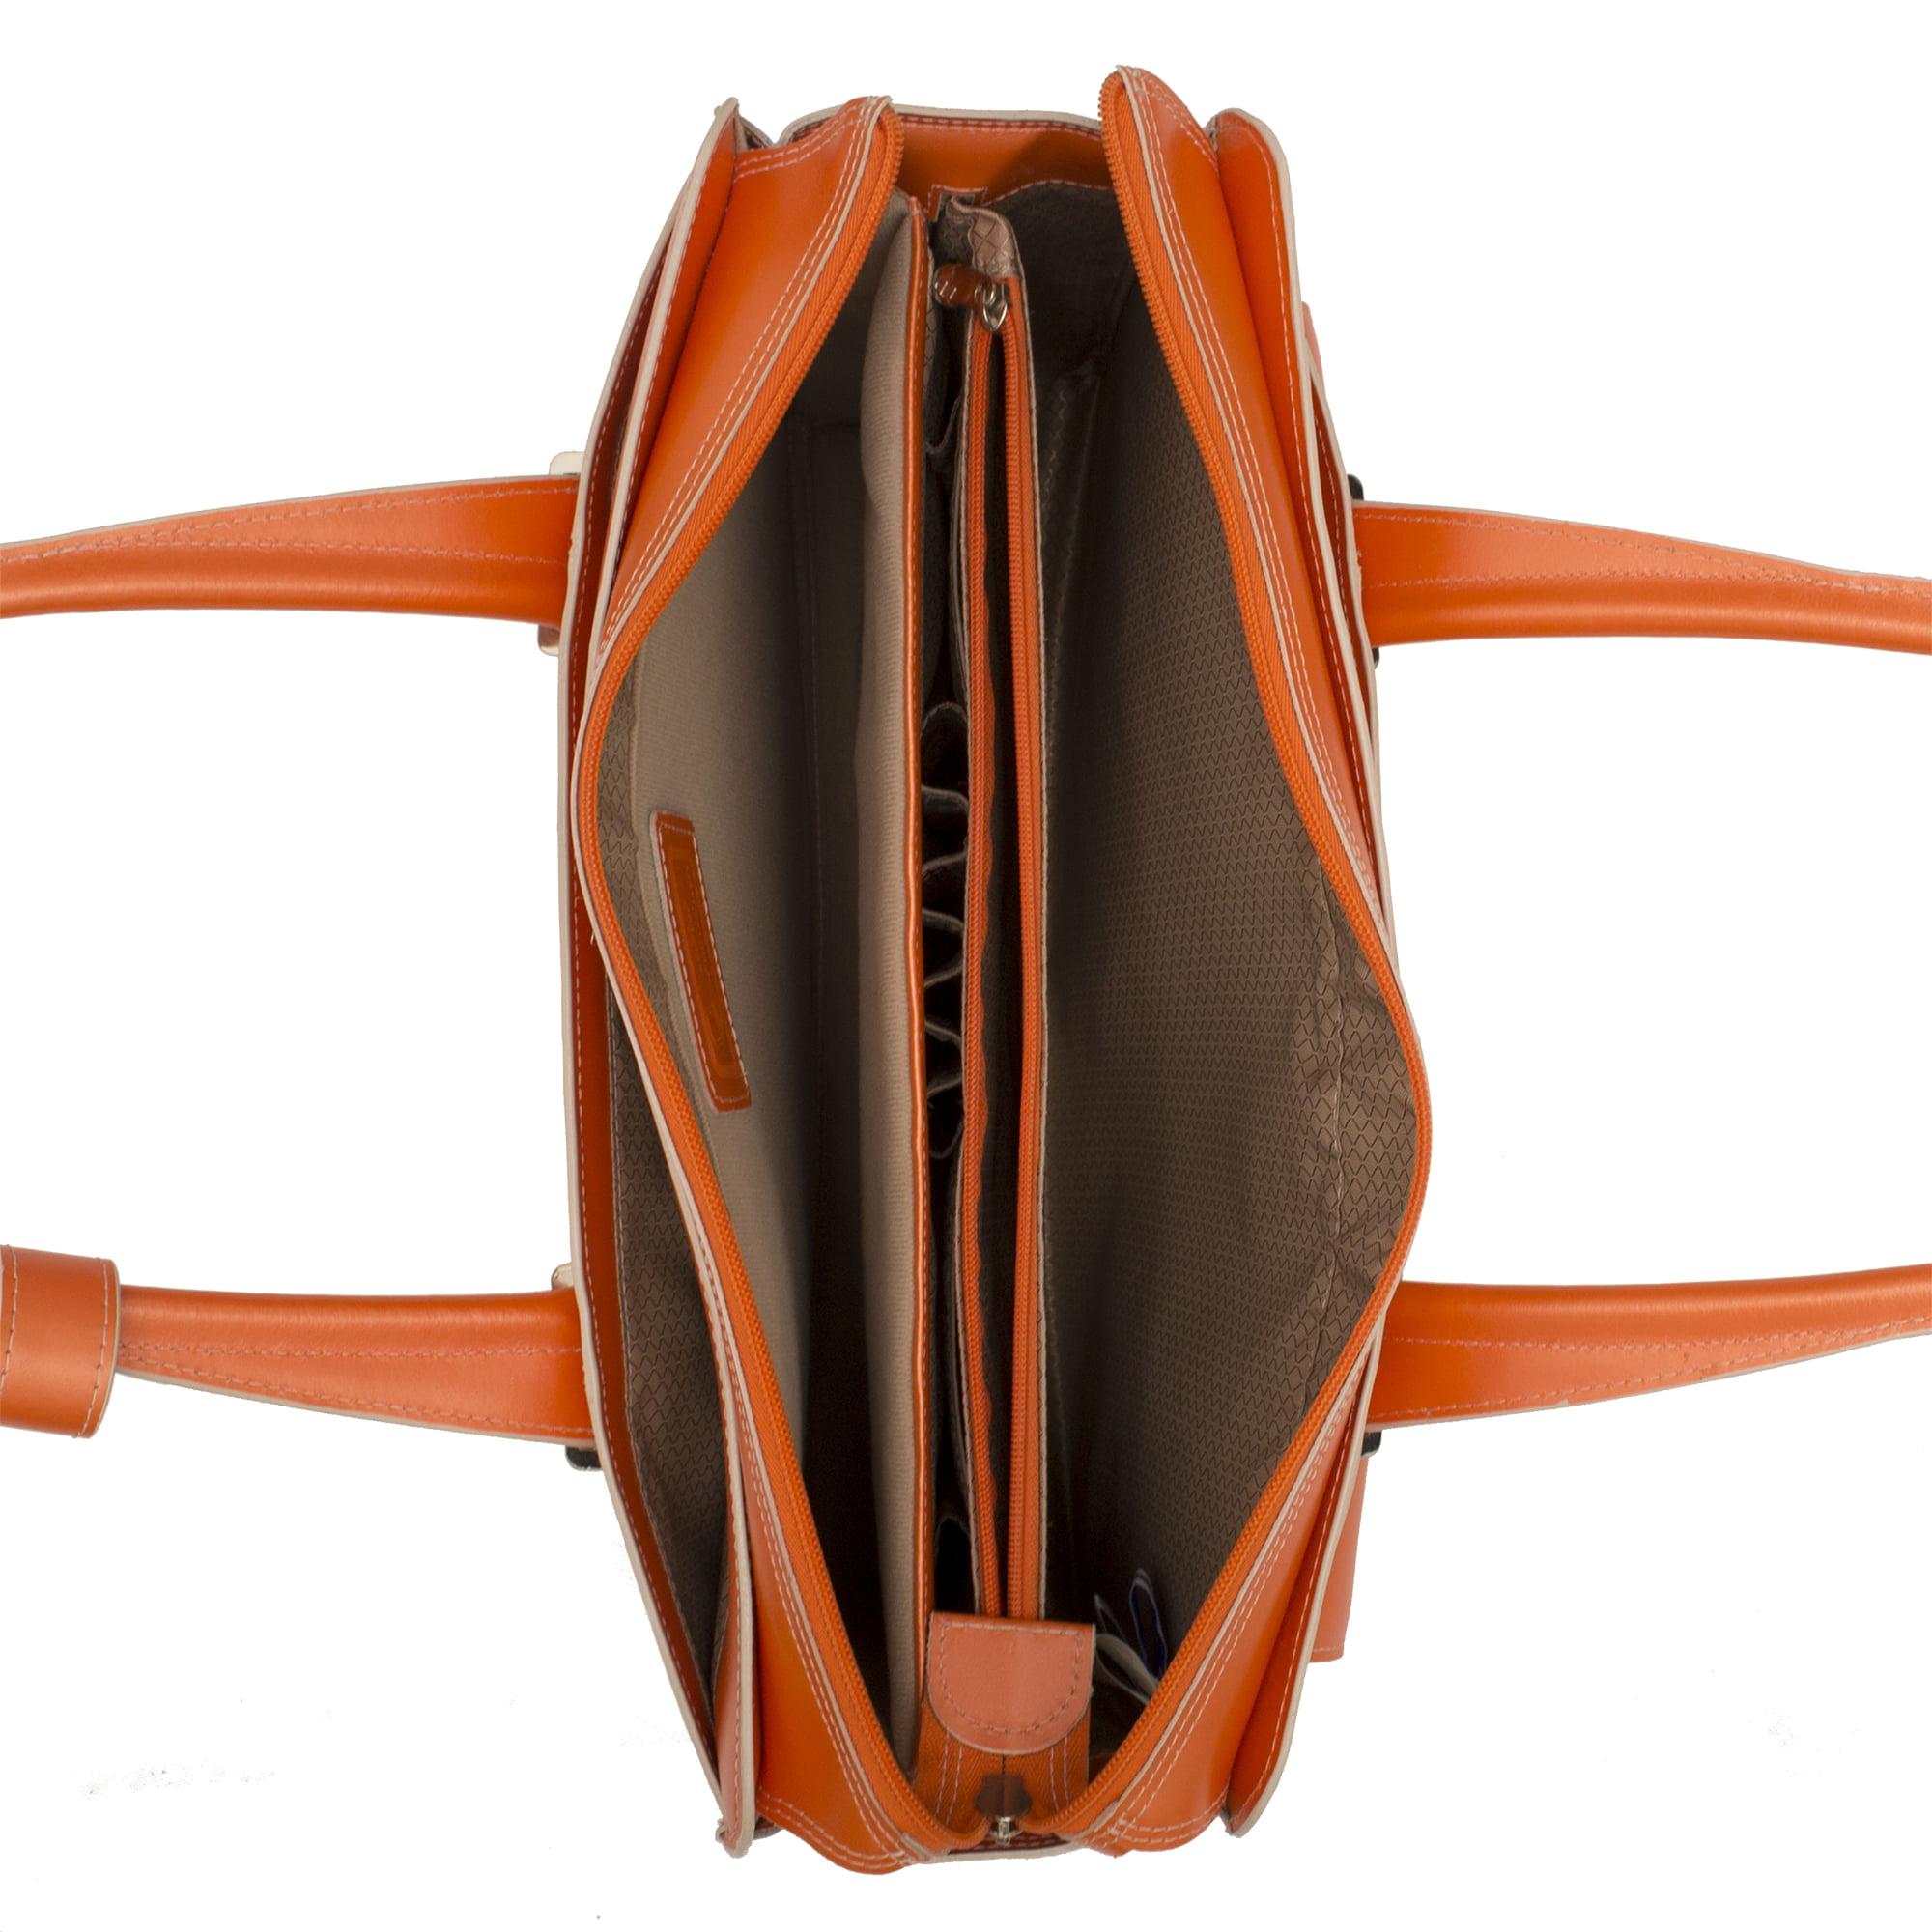 McKlein 96540 ALEXIS Leather Ladies Briefcase- Orange - image 2 of 4